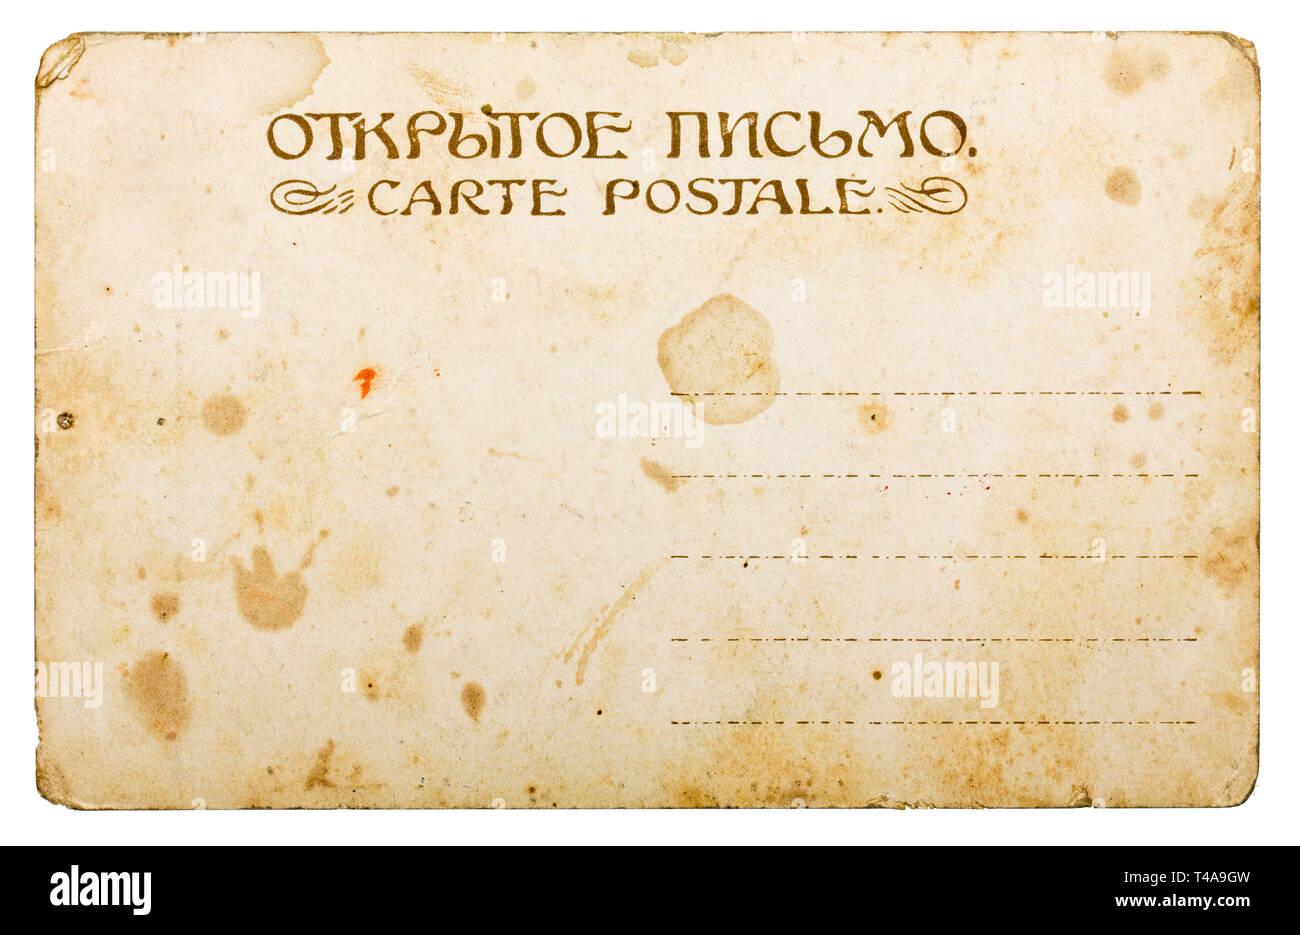 Retro post card isolated on white Photo Stock